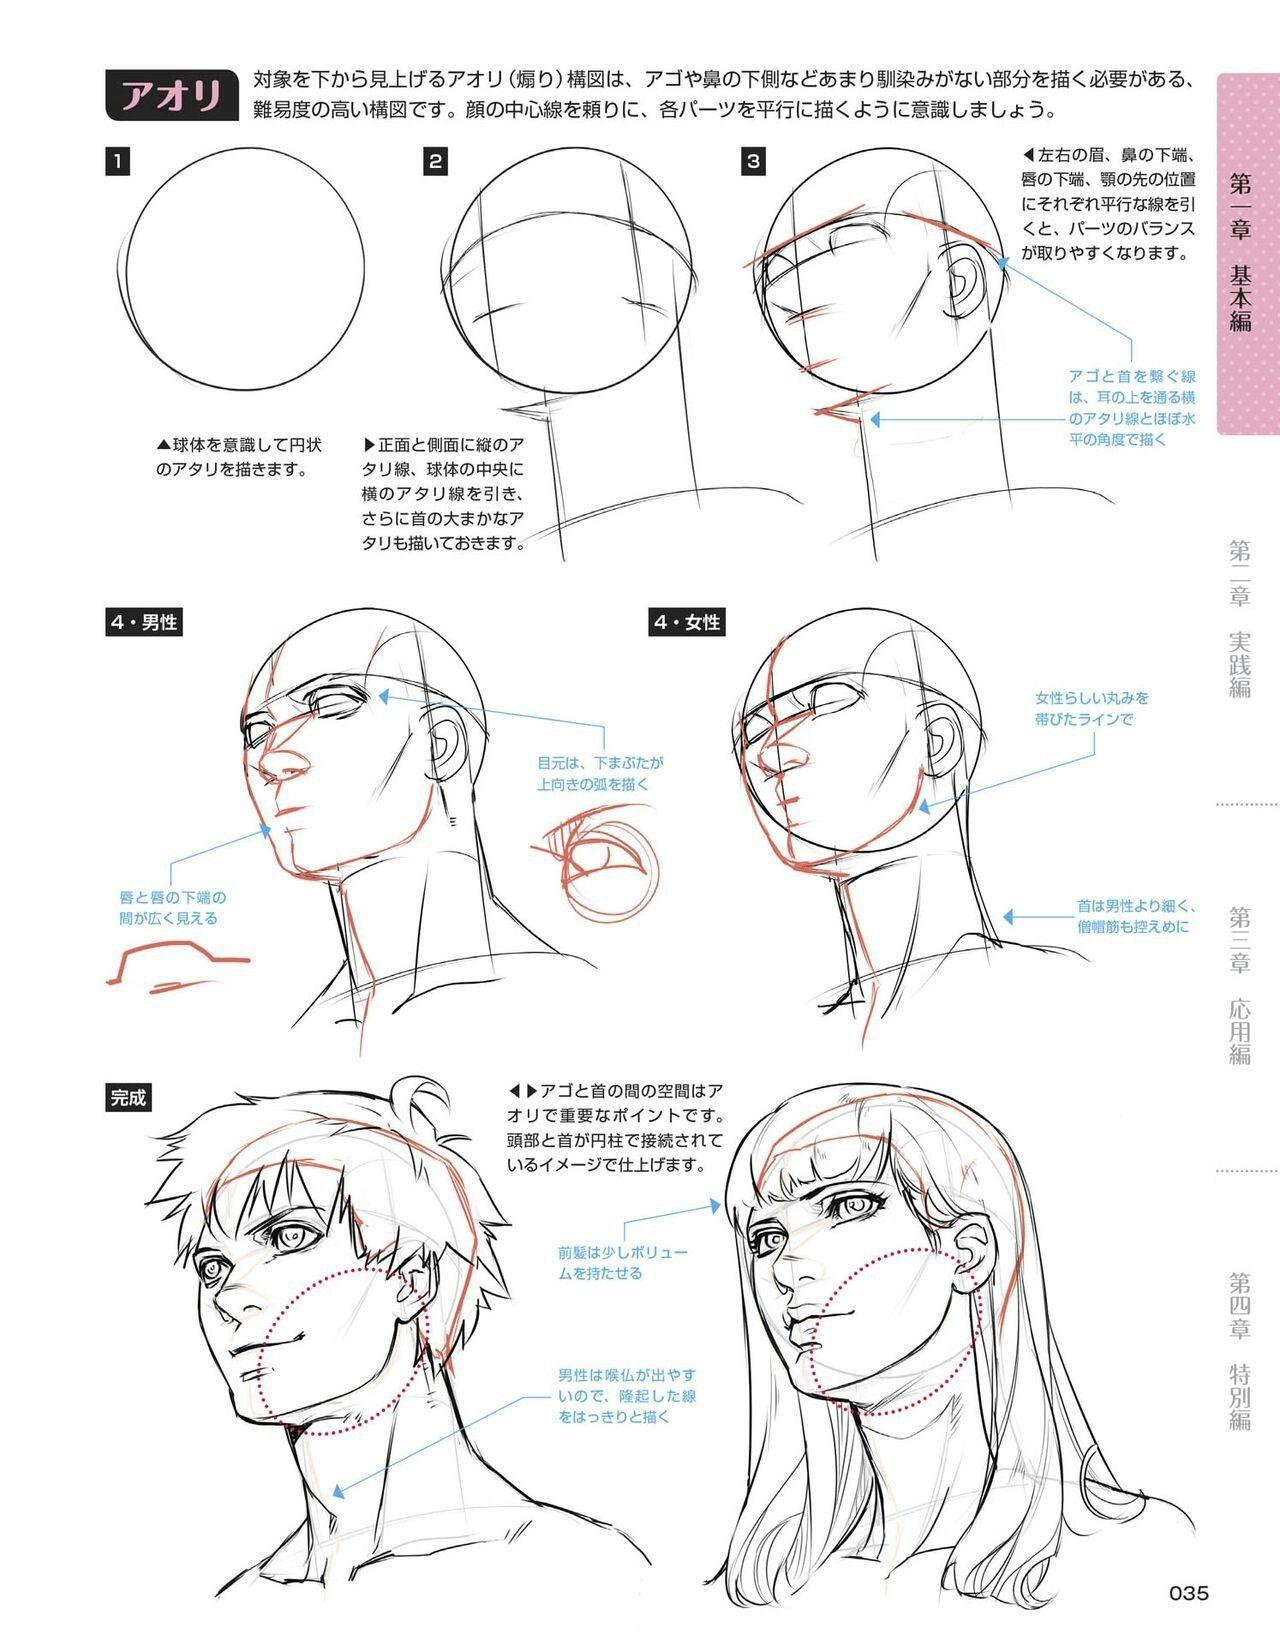 Groß Human Anatomy Drawing Lessons Galerie - Anatomie Von ...